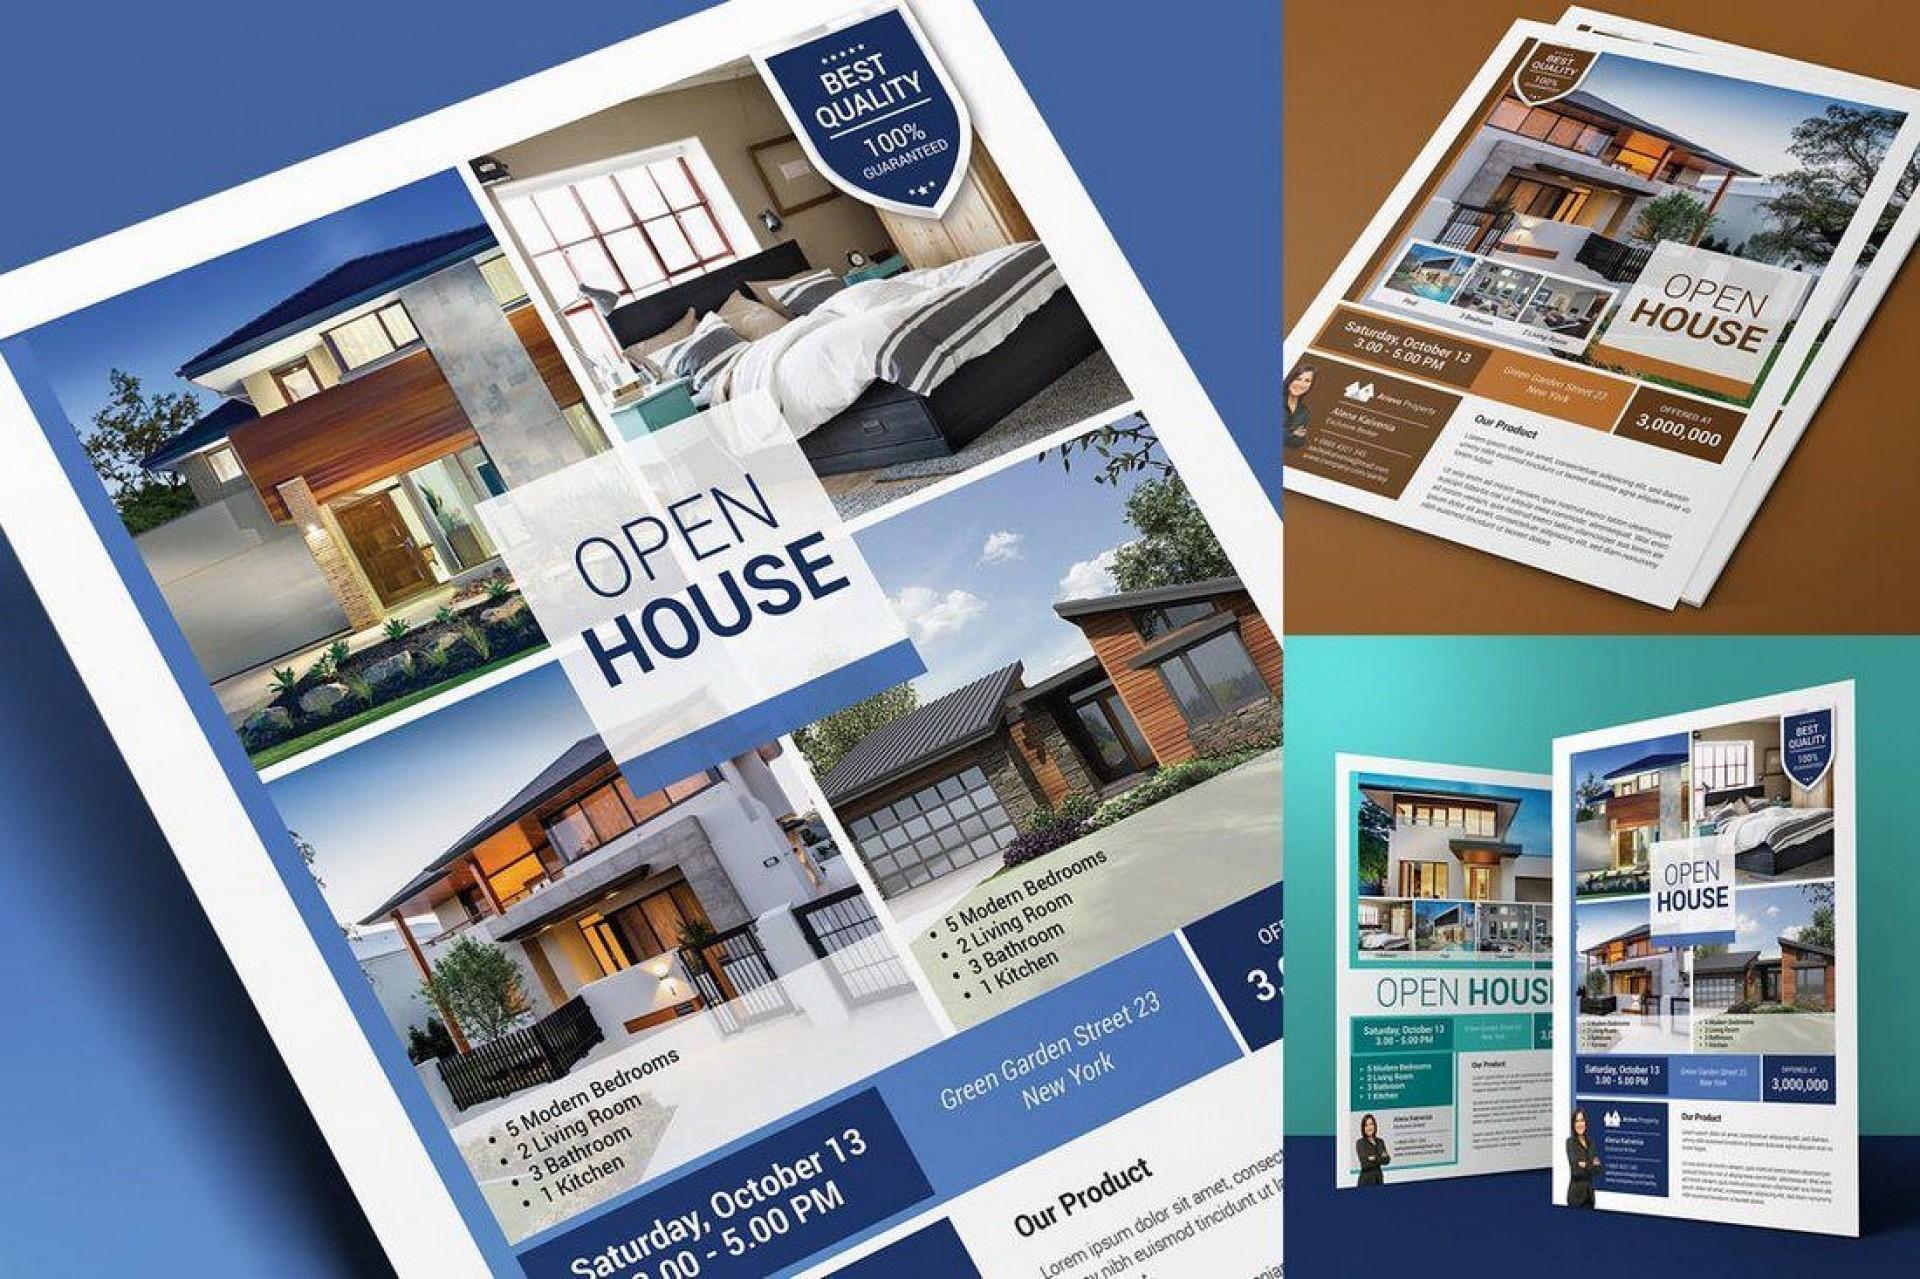 009 Unusual Open House Flyer Template Free Highest Quality  Holiday Preschool School Microsoft1920